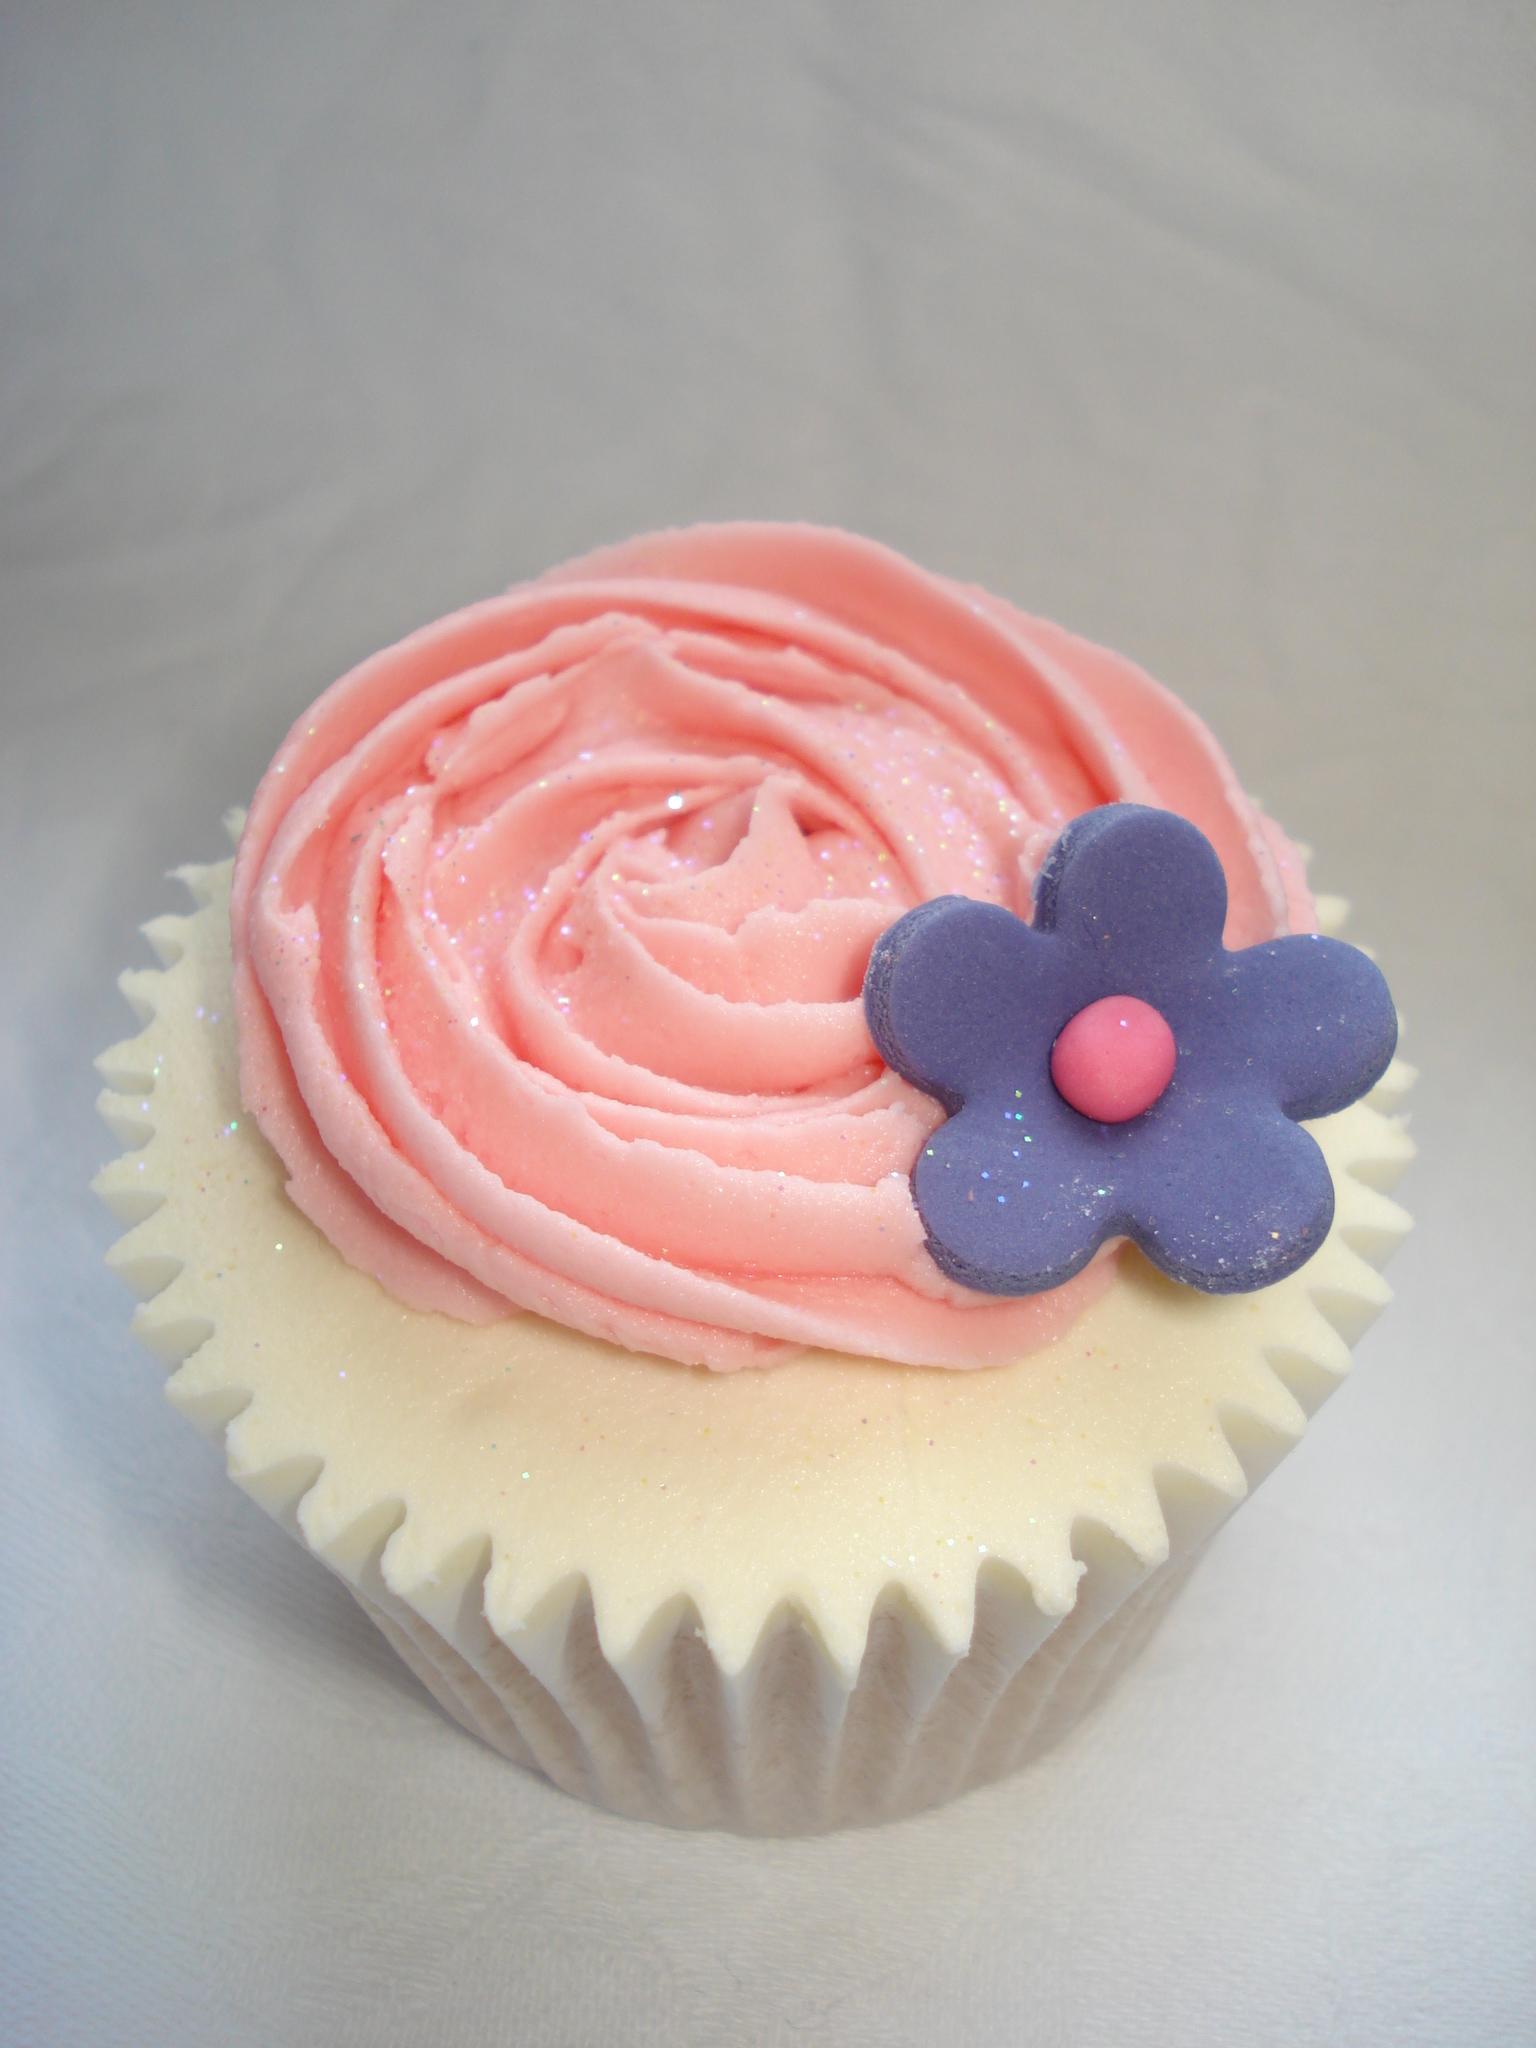 Rose swirl and purple flower cupcake